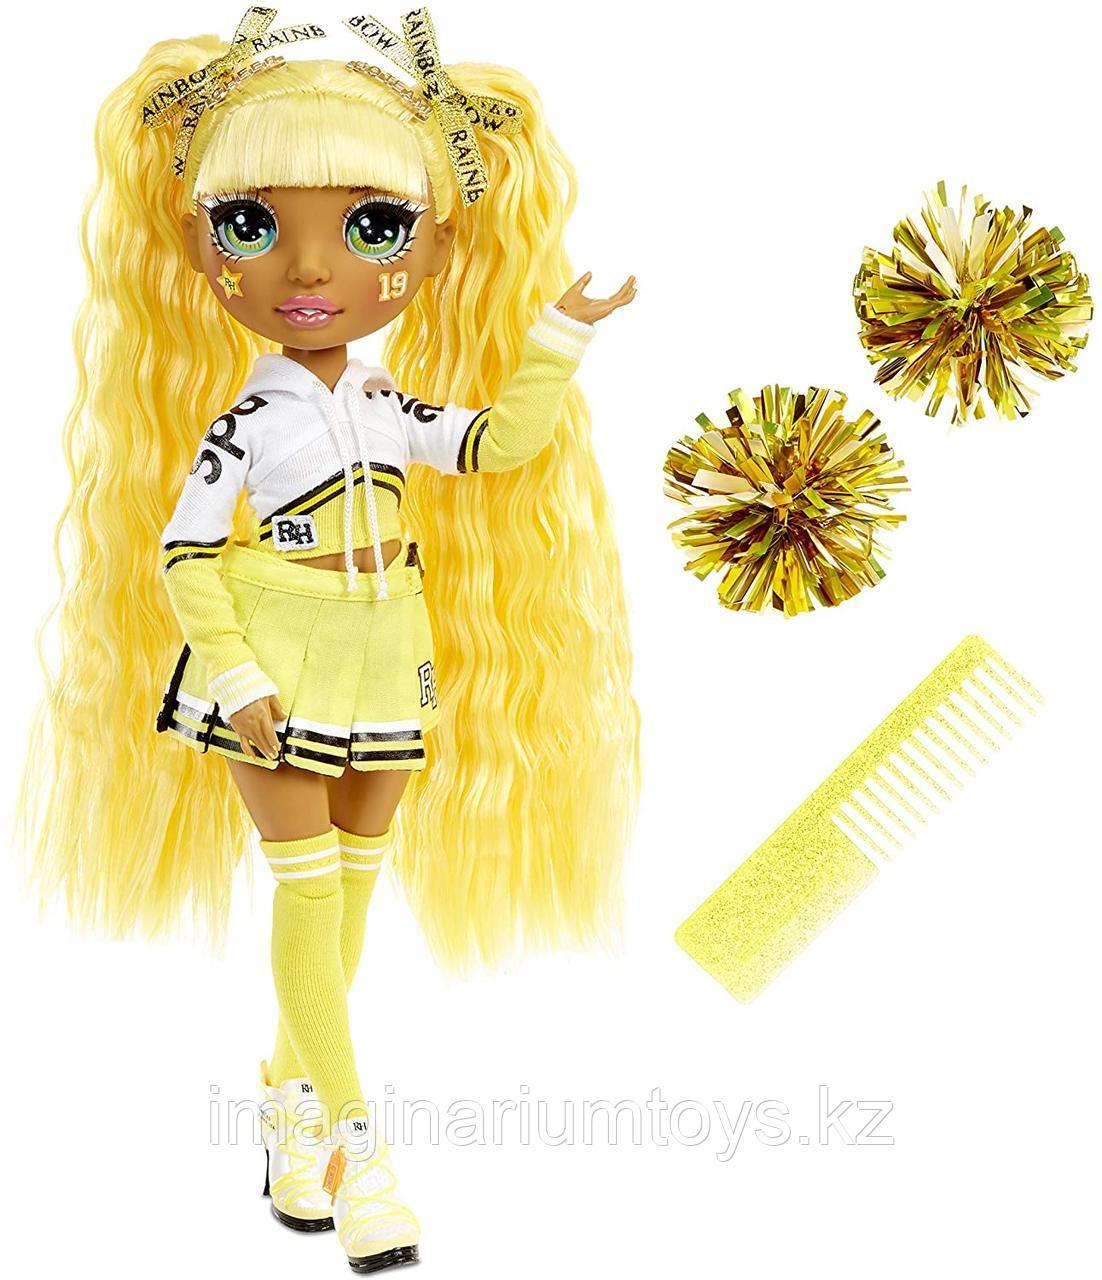 Кукла Реинбоу Хай золотая Rainbow High Sunny Madison Чирлидер